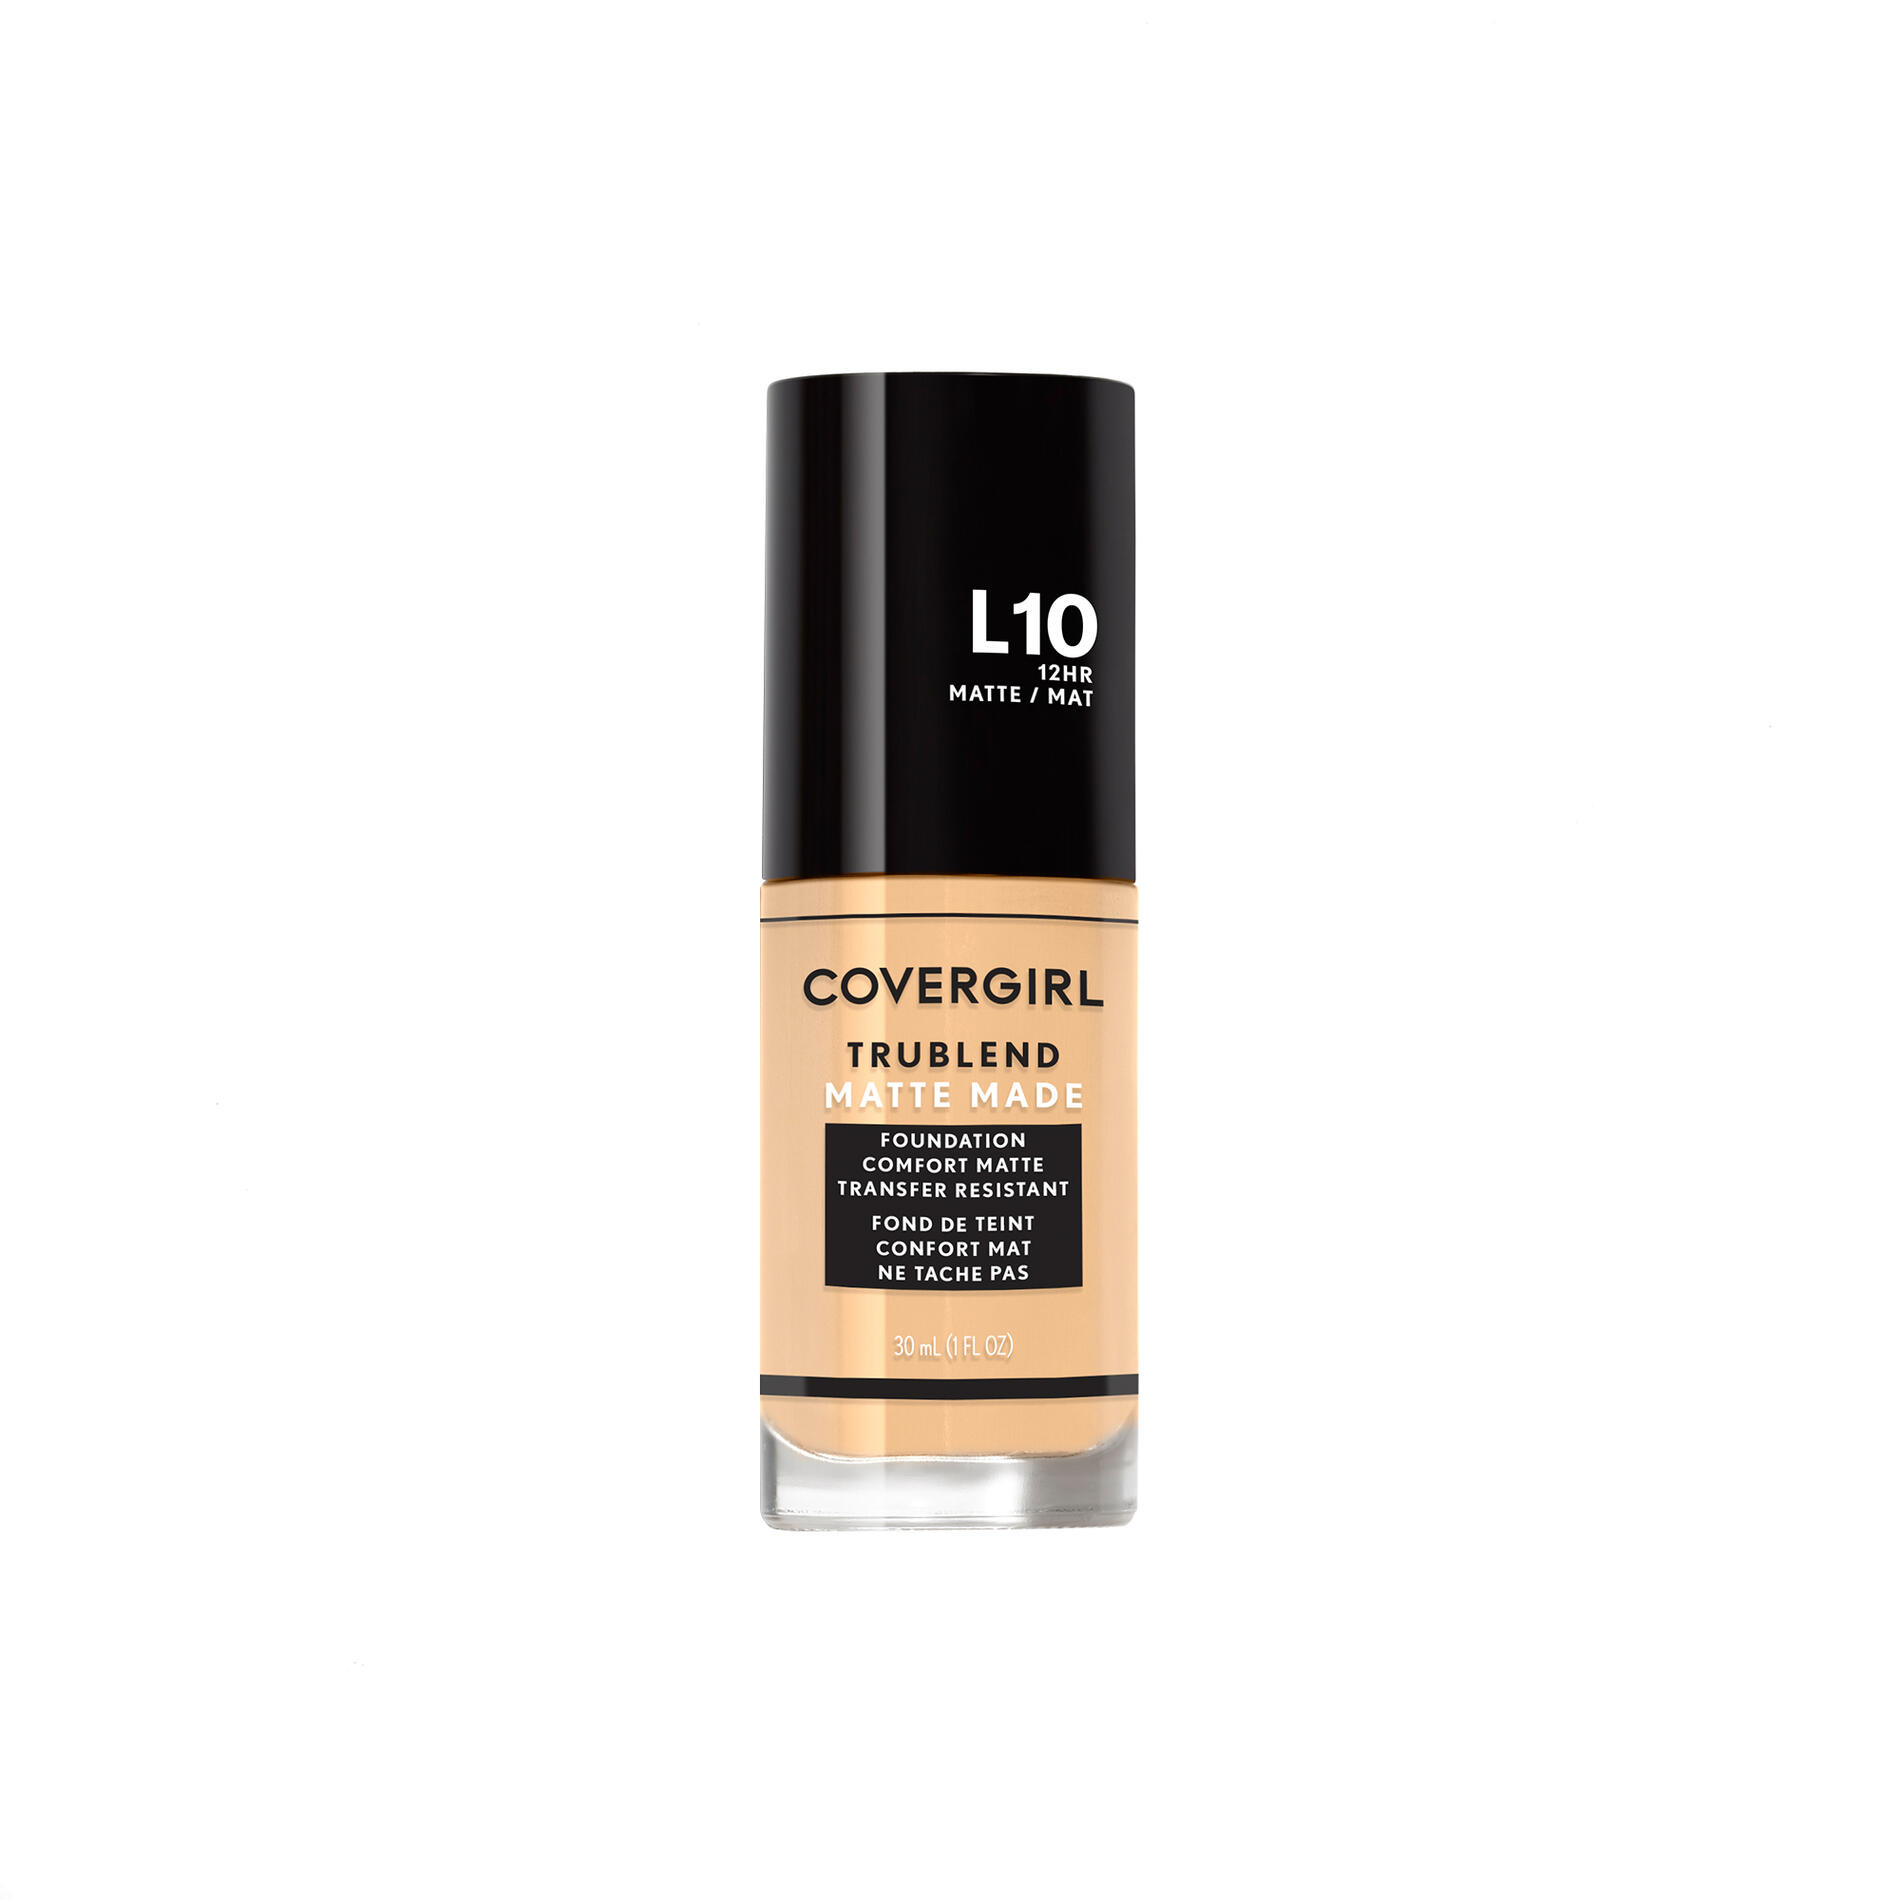 Covergirl - TruBlend Matte Made Liquid Foundation